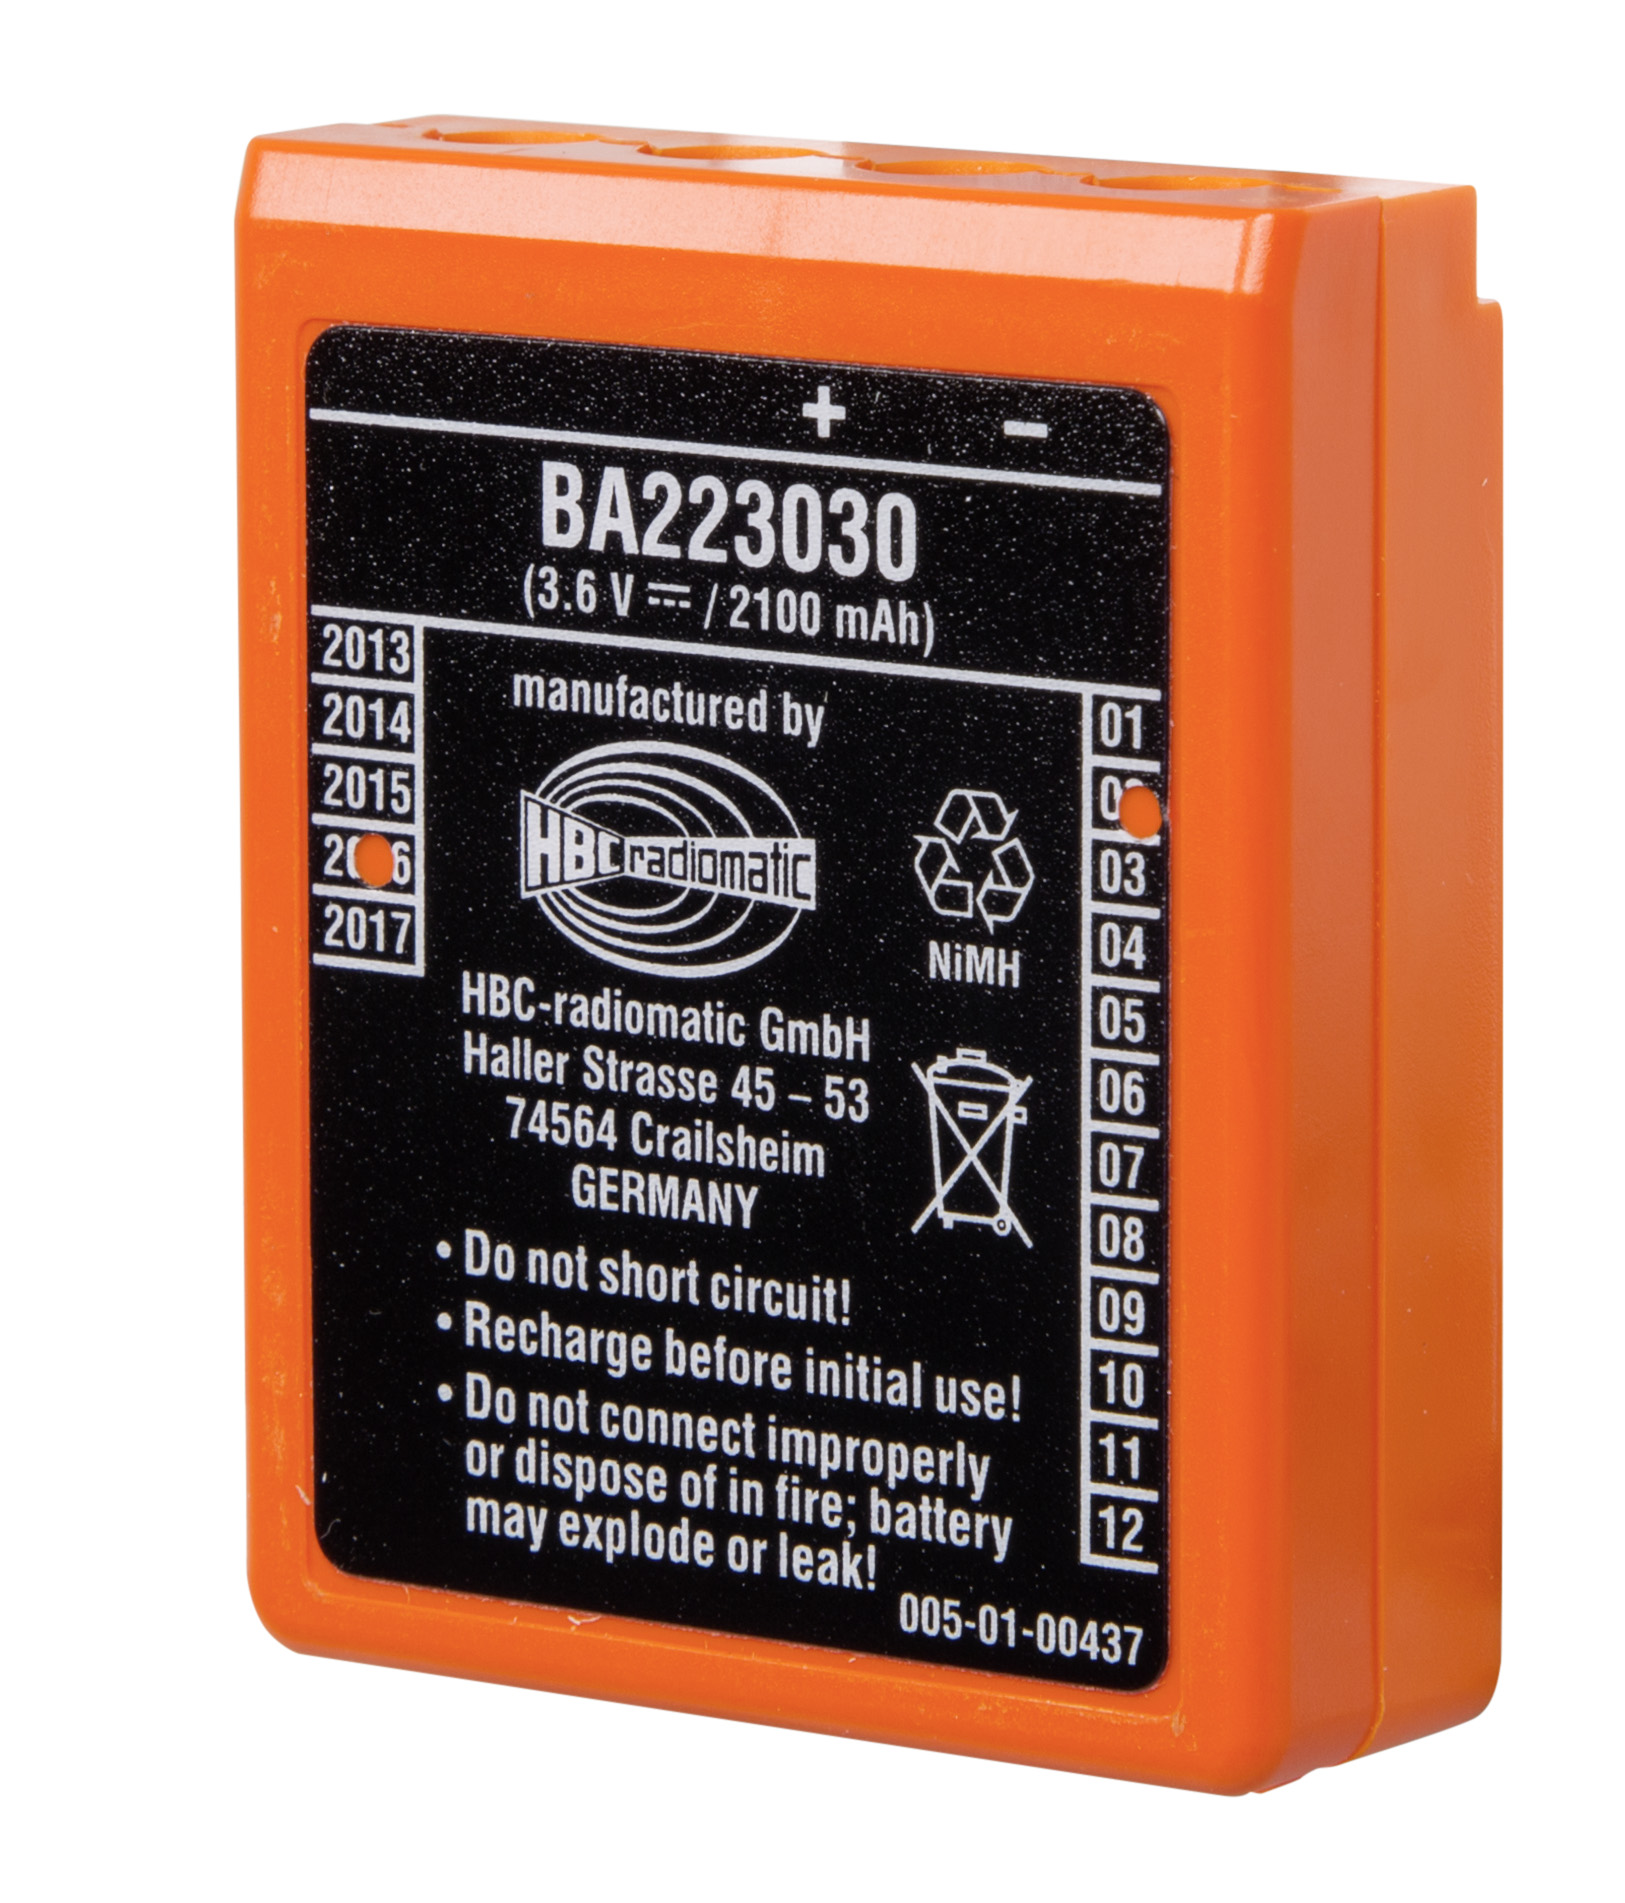 BA223030 Battery - CTS